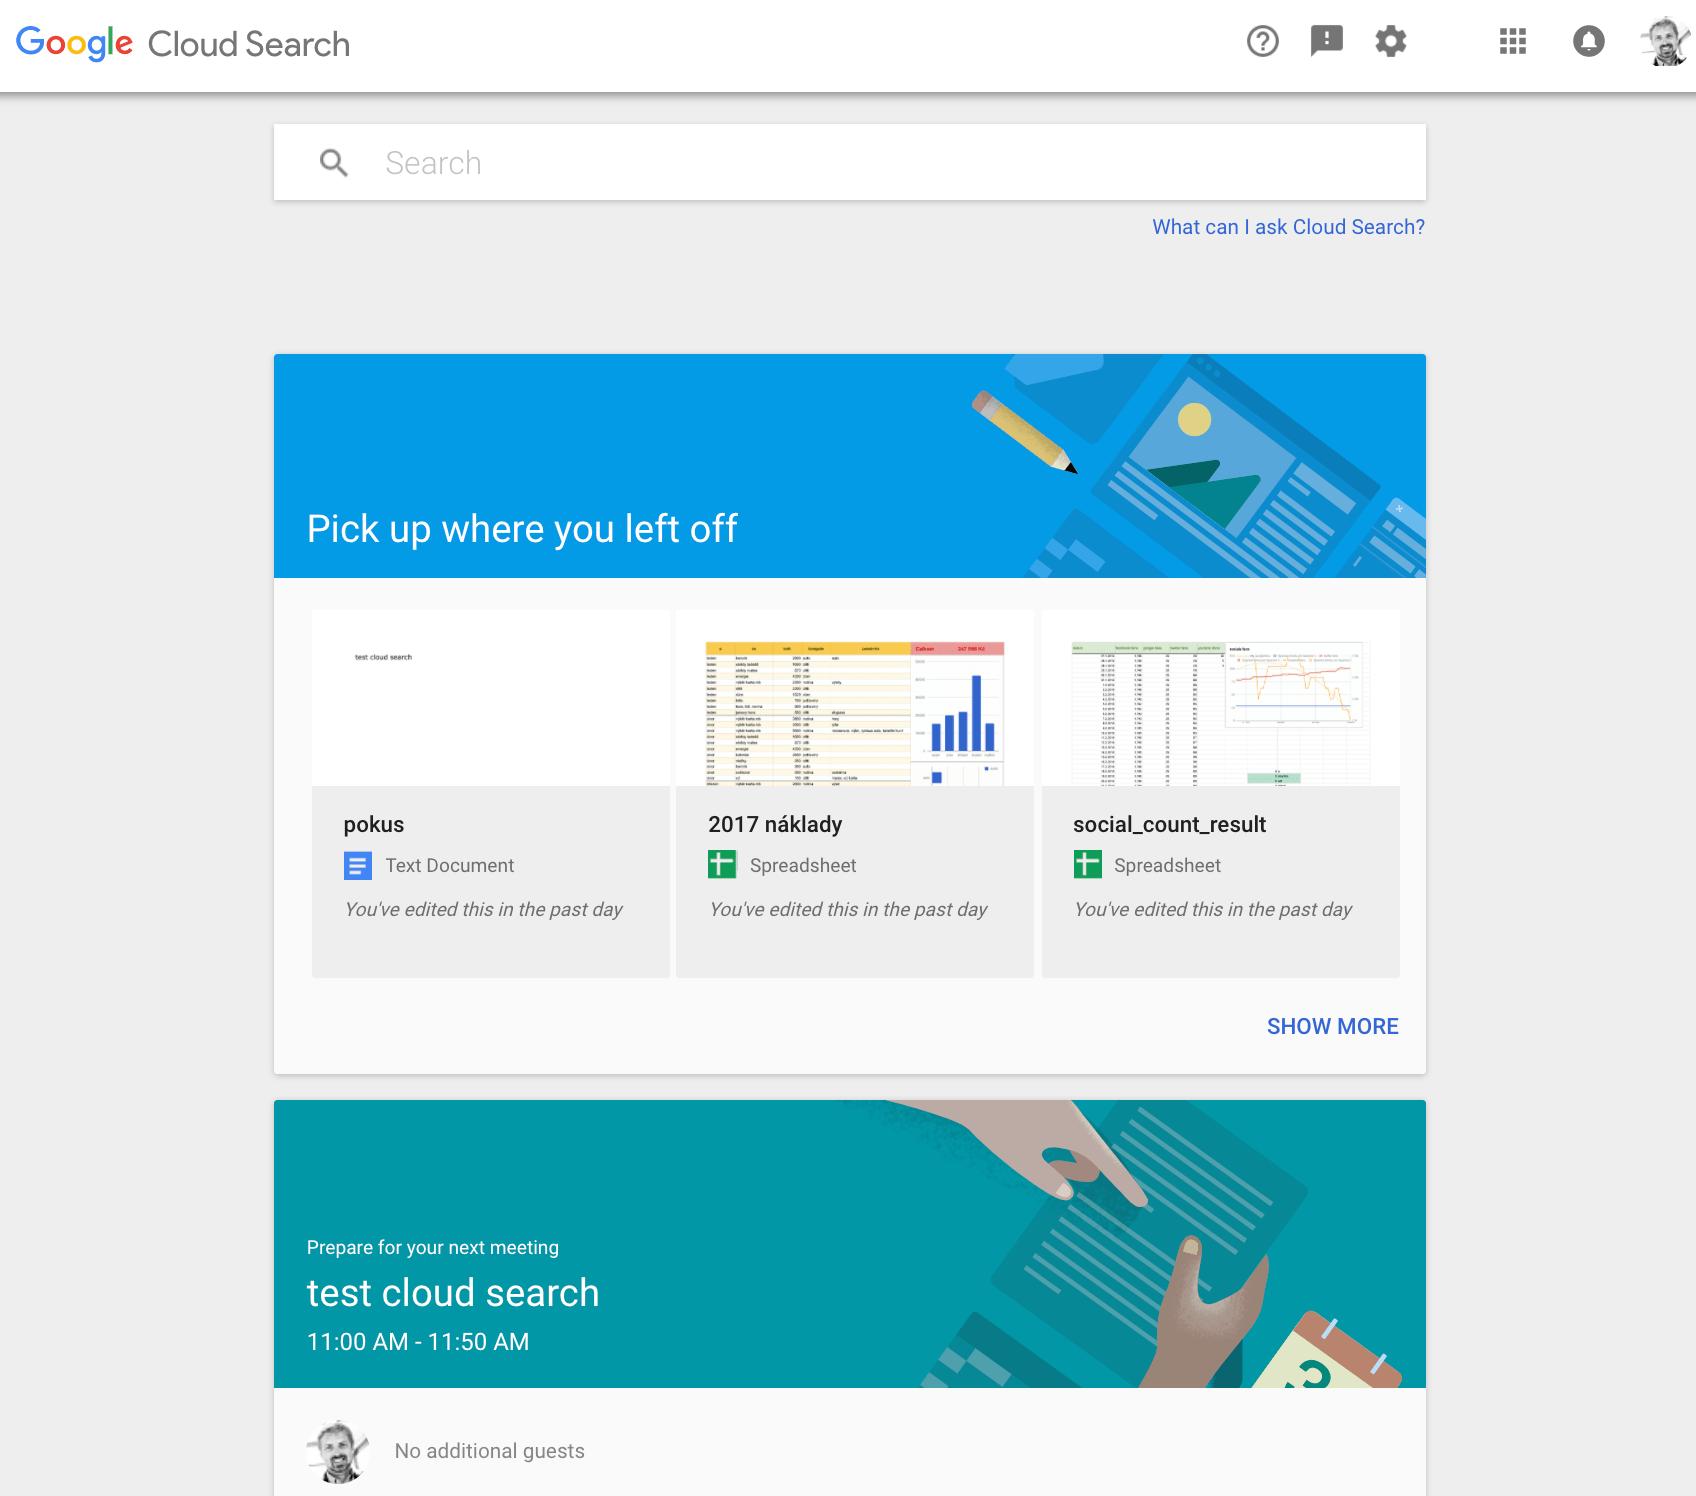 Ukázka rozhraní Google Cloud search